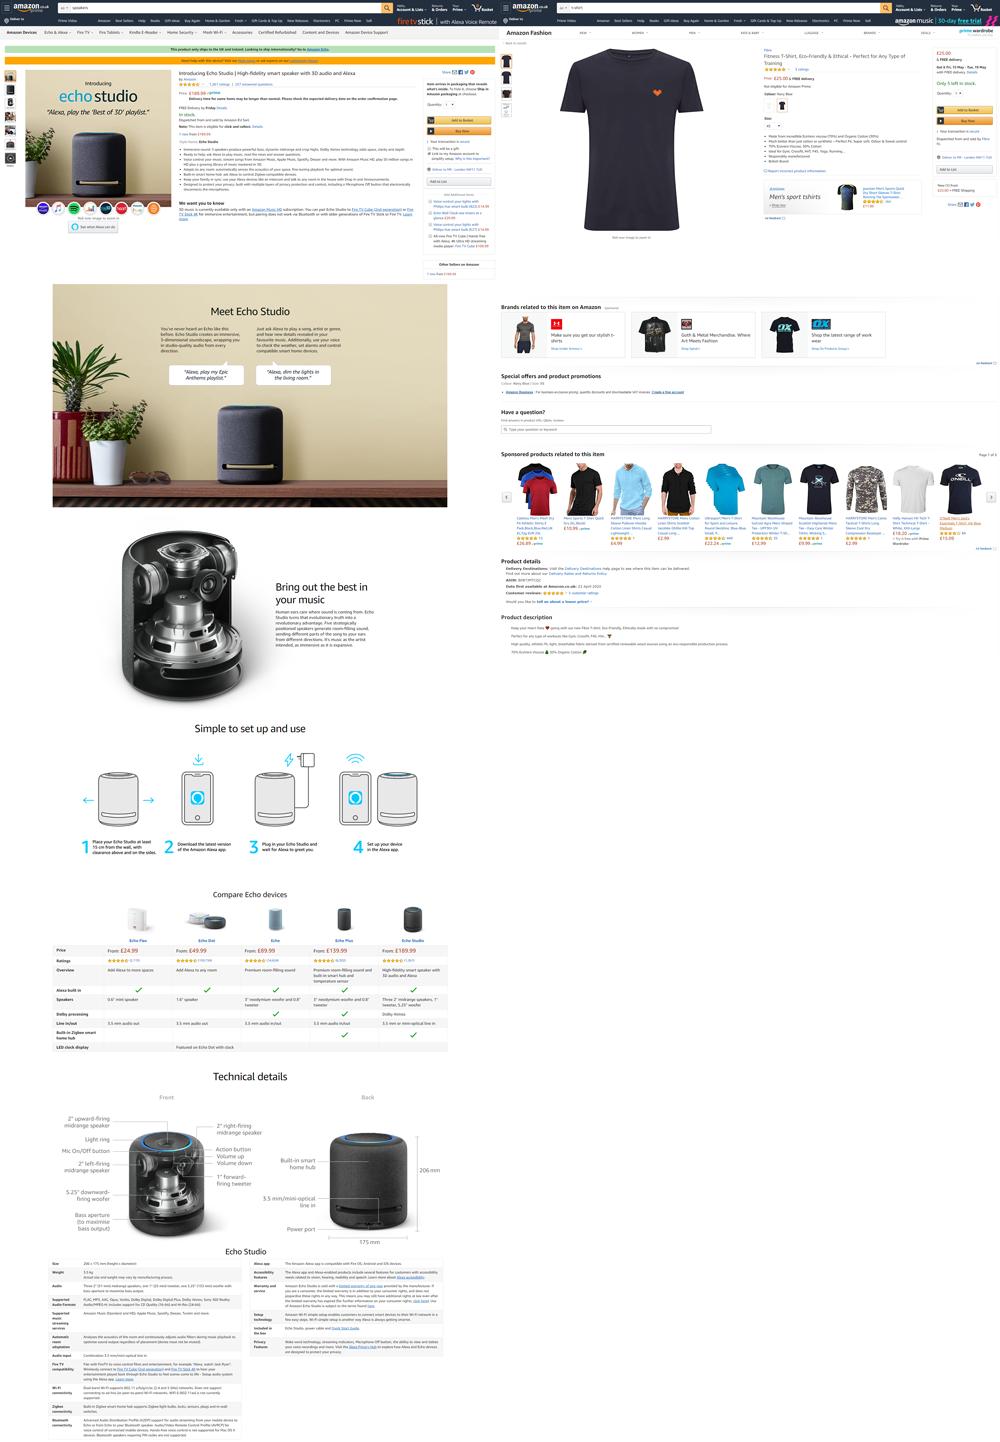 Amazon-A+-listing-vs-standard